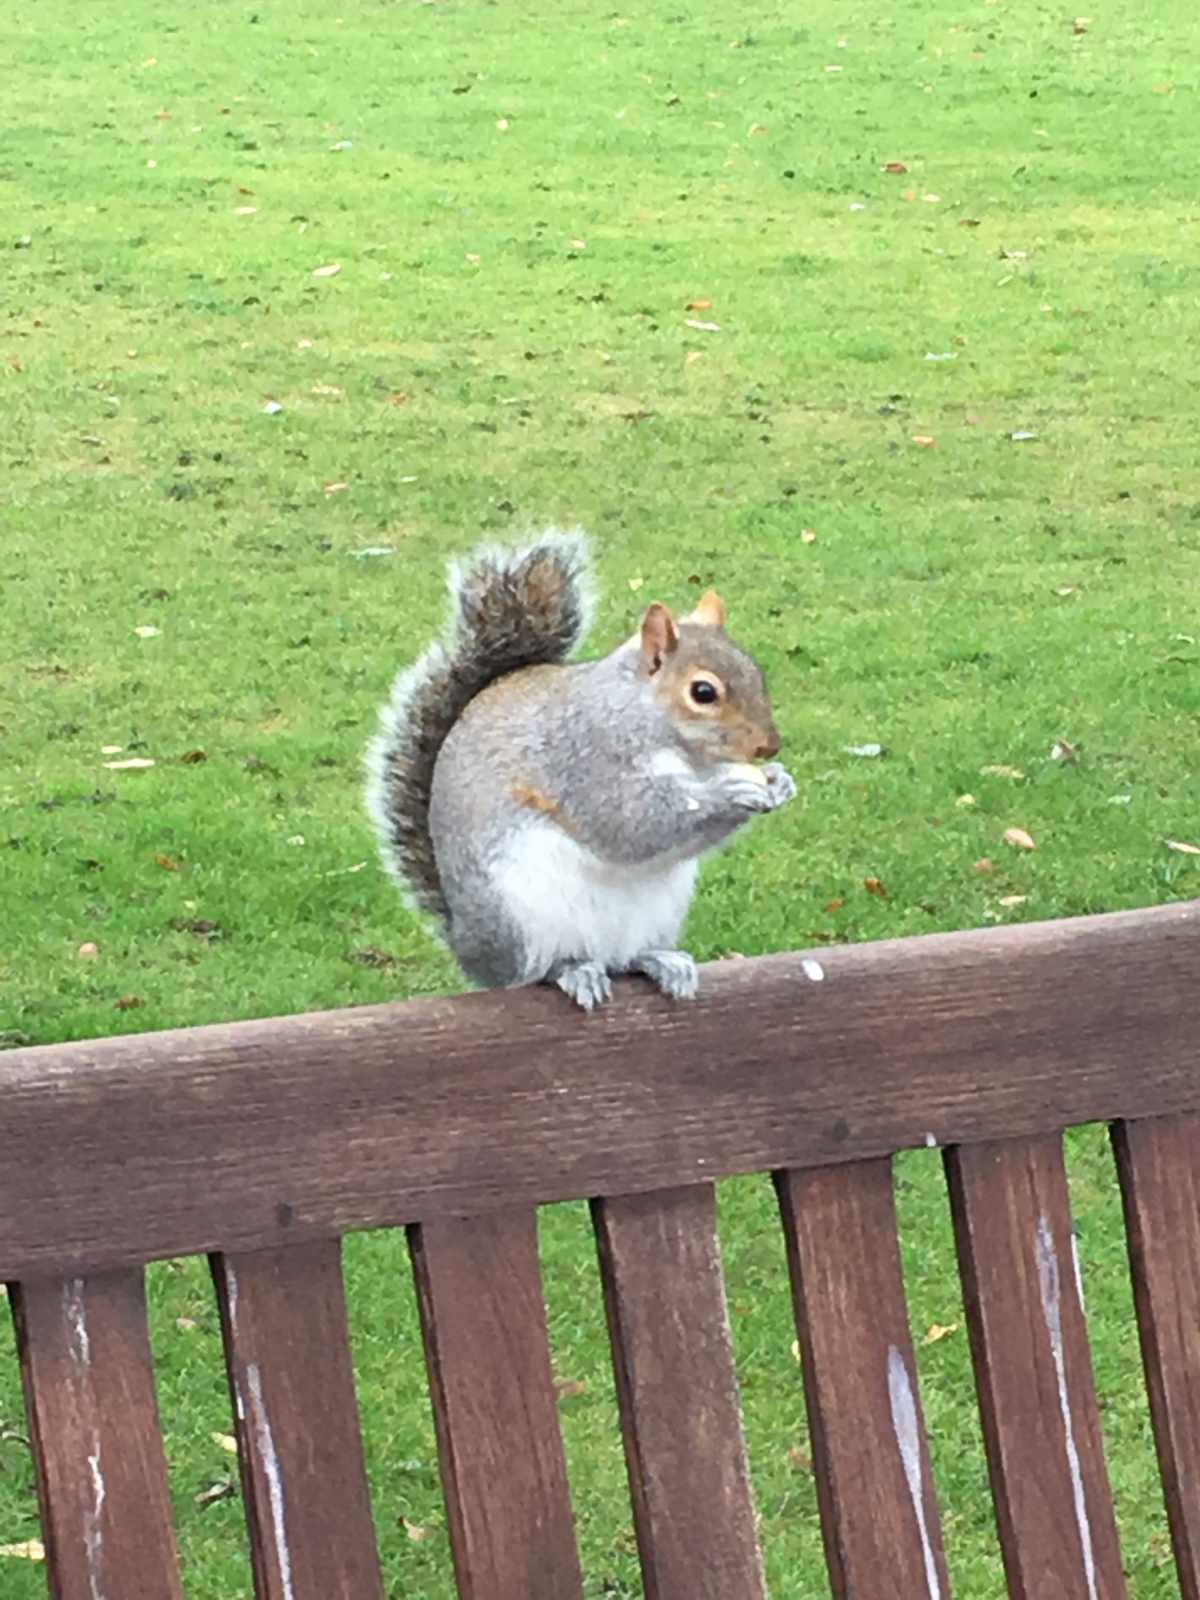 Squirrel, Kensington Gardens, London, lunchSquirrel, Kensington Gardens, London, lunch